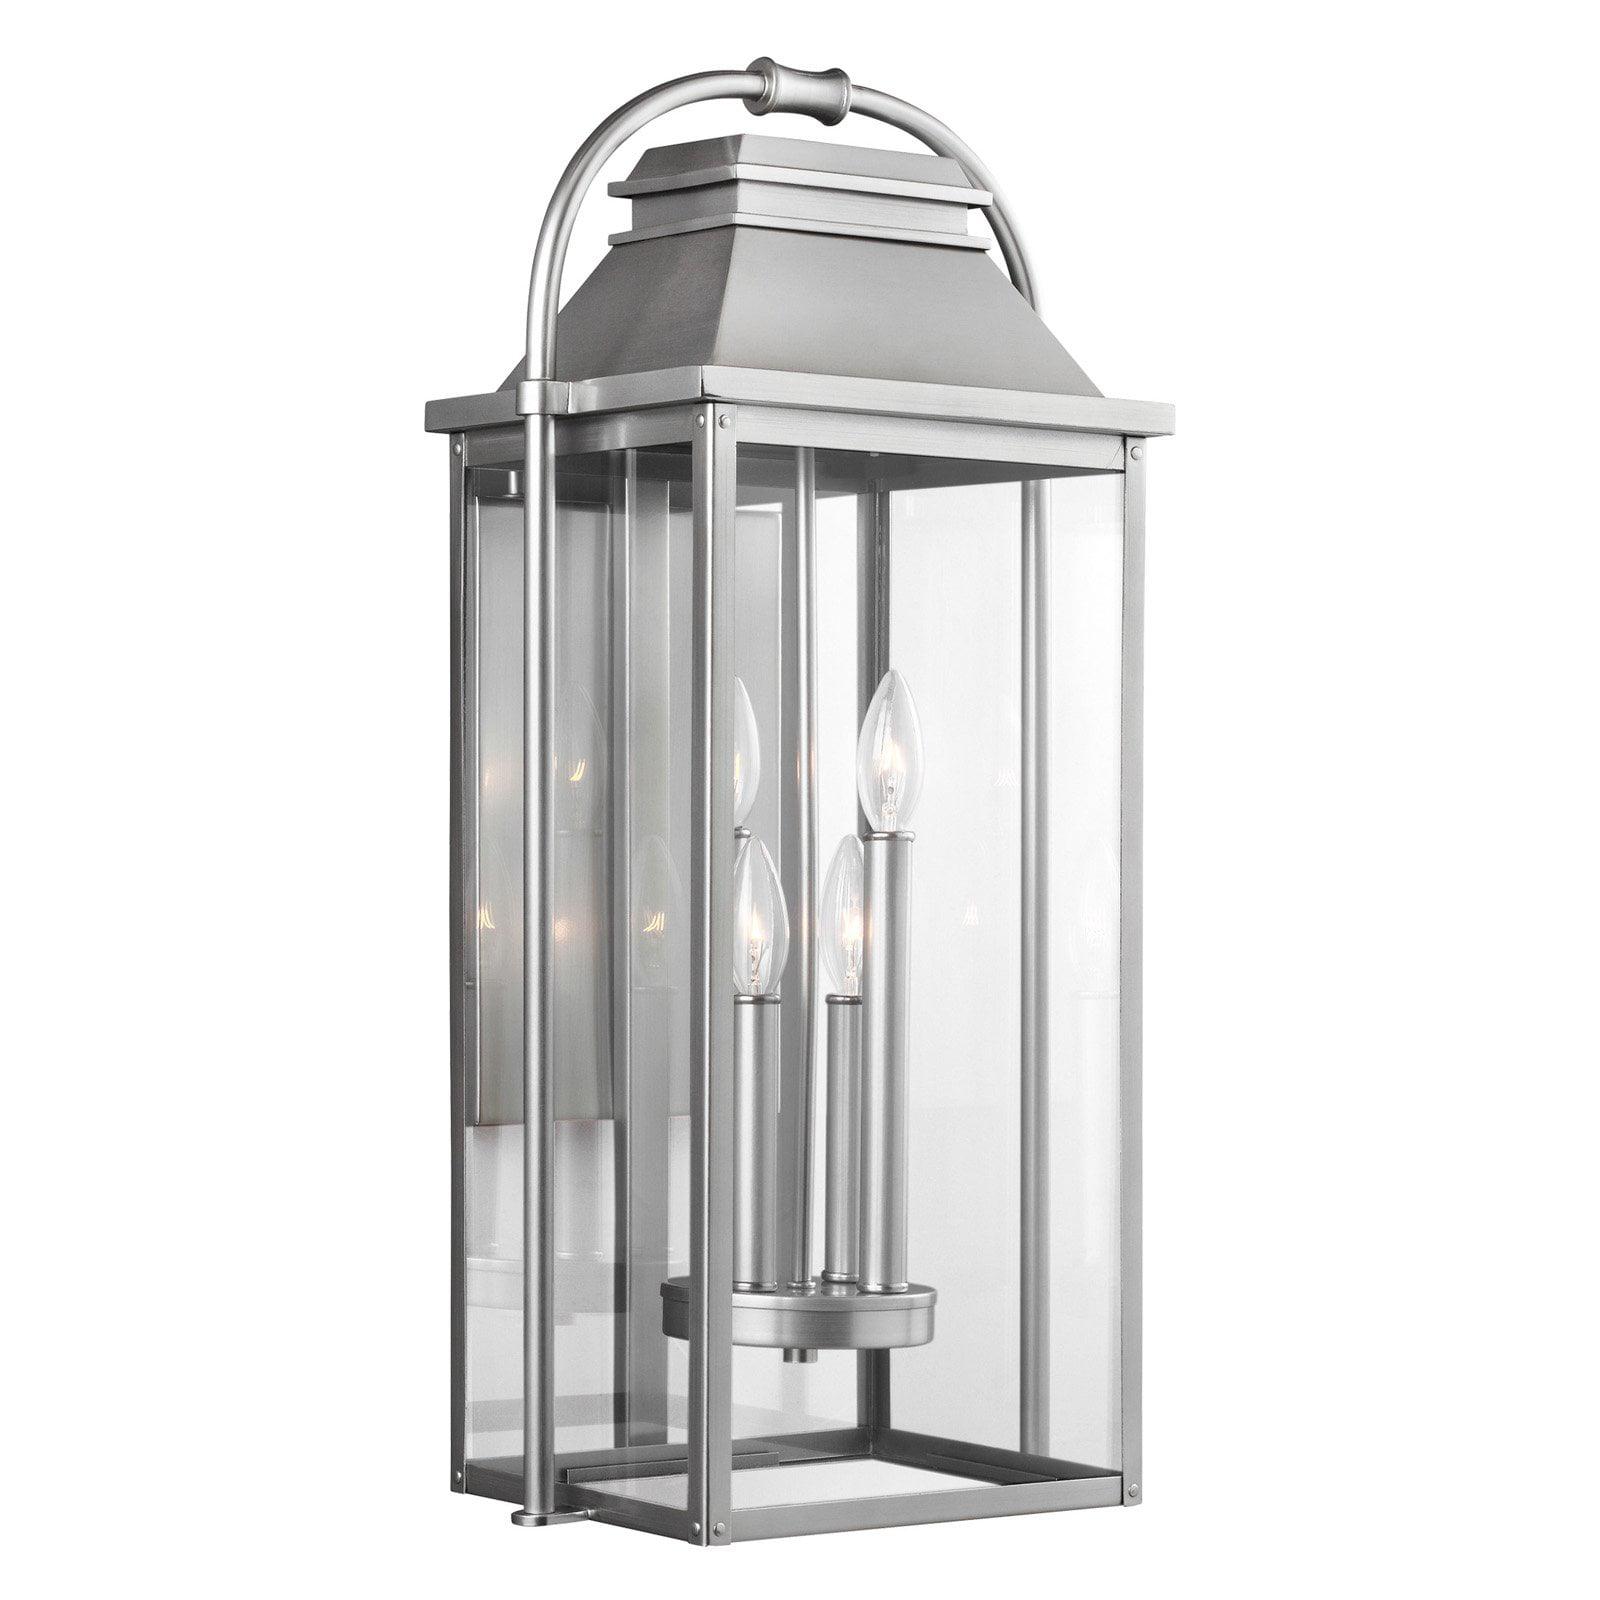 Feiss Wellsworth Outdoor Wall Lantern